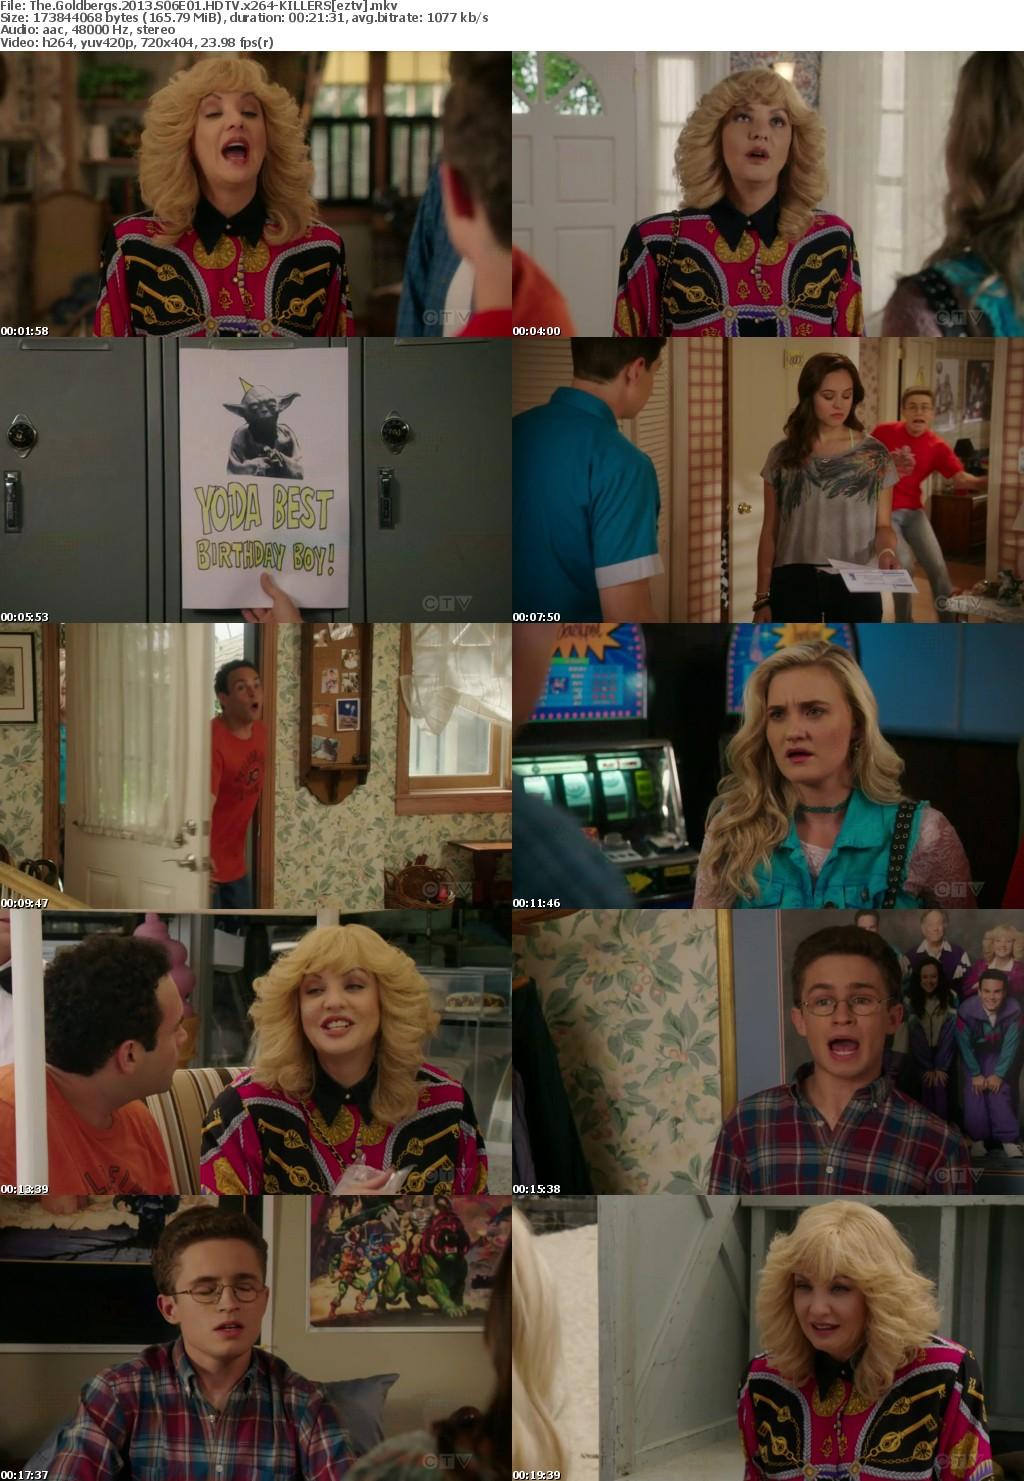 The Goldbergs 2013 S06E01 HDTV x264-KILLERS